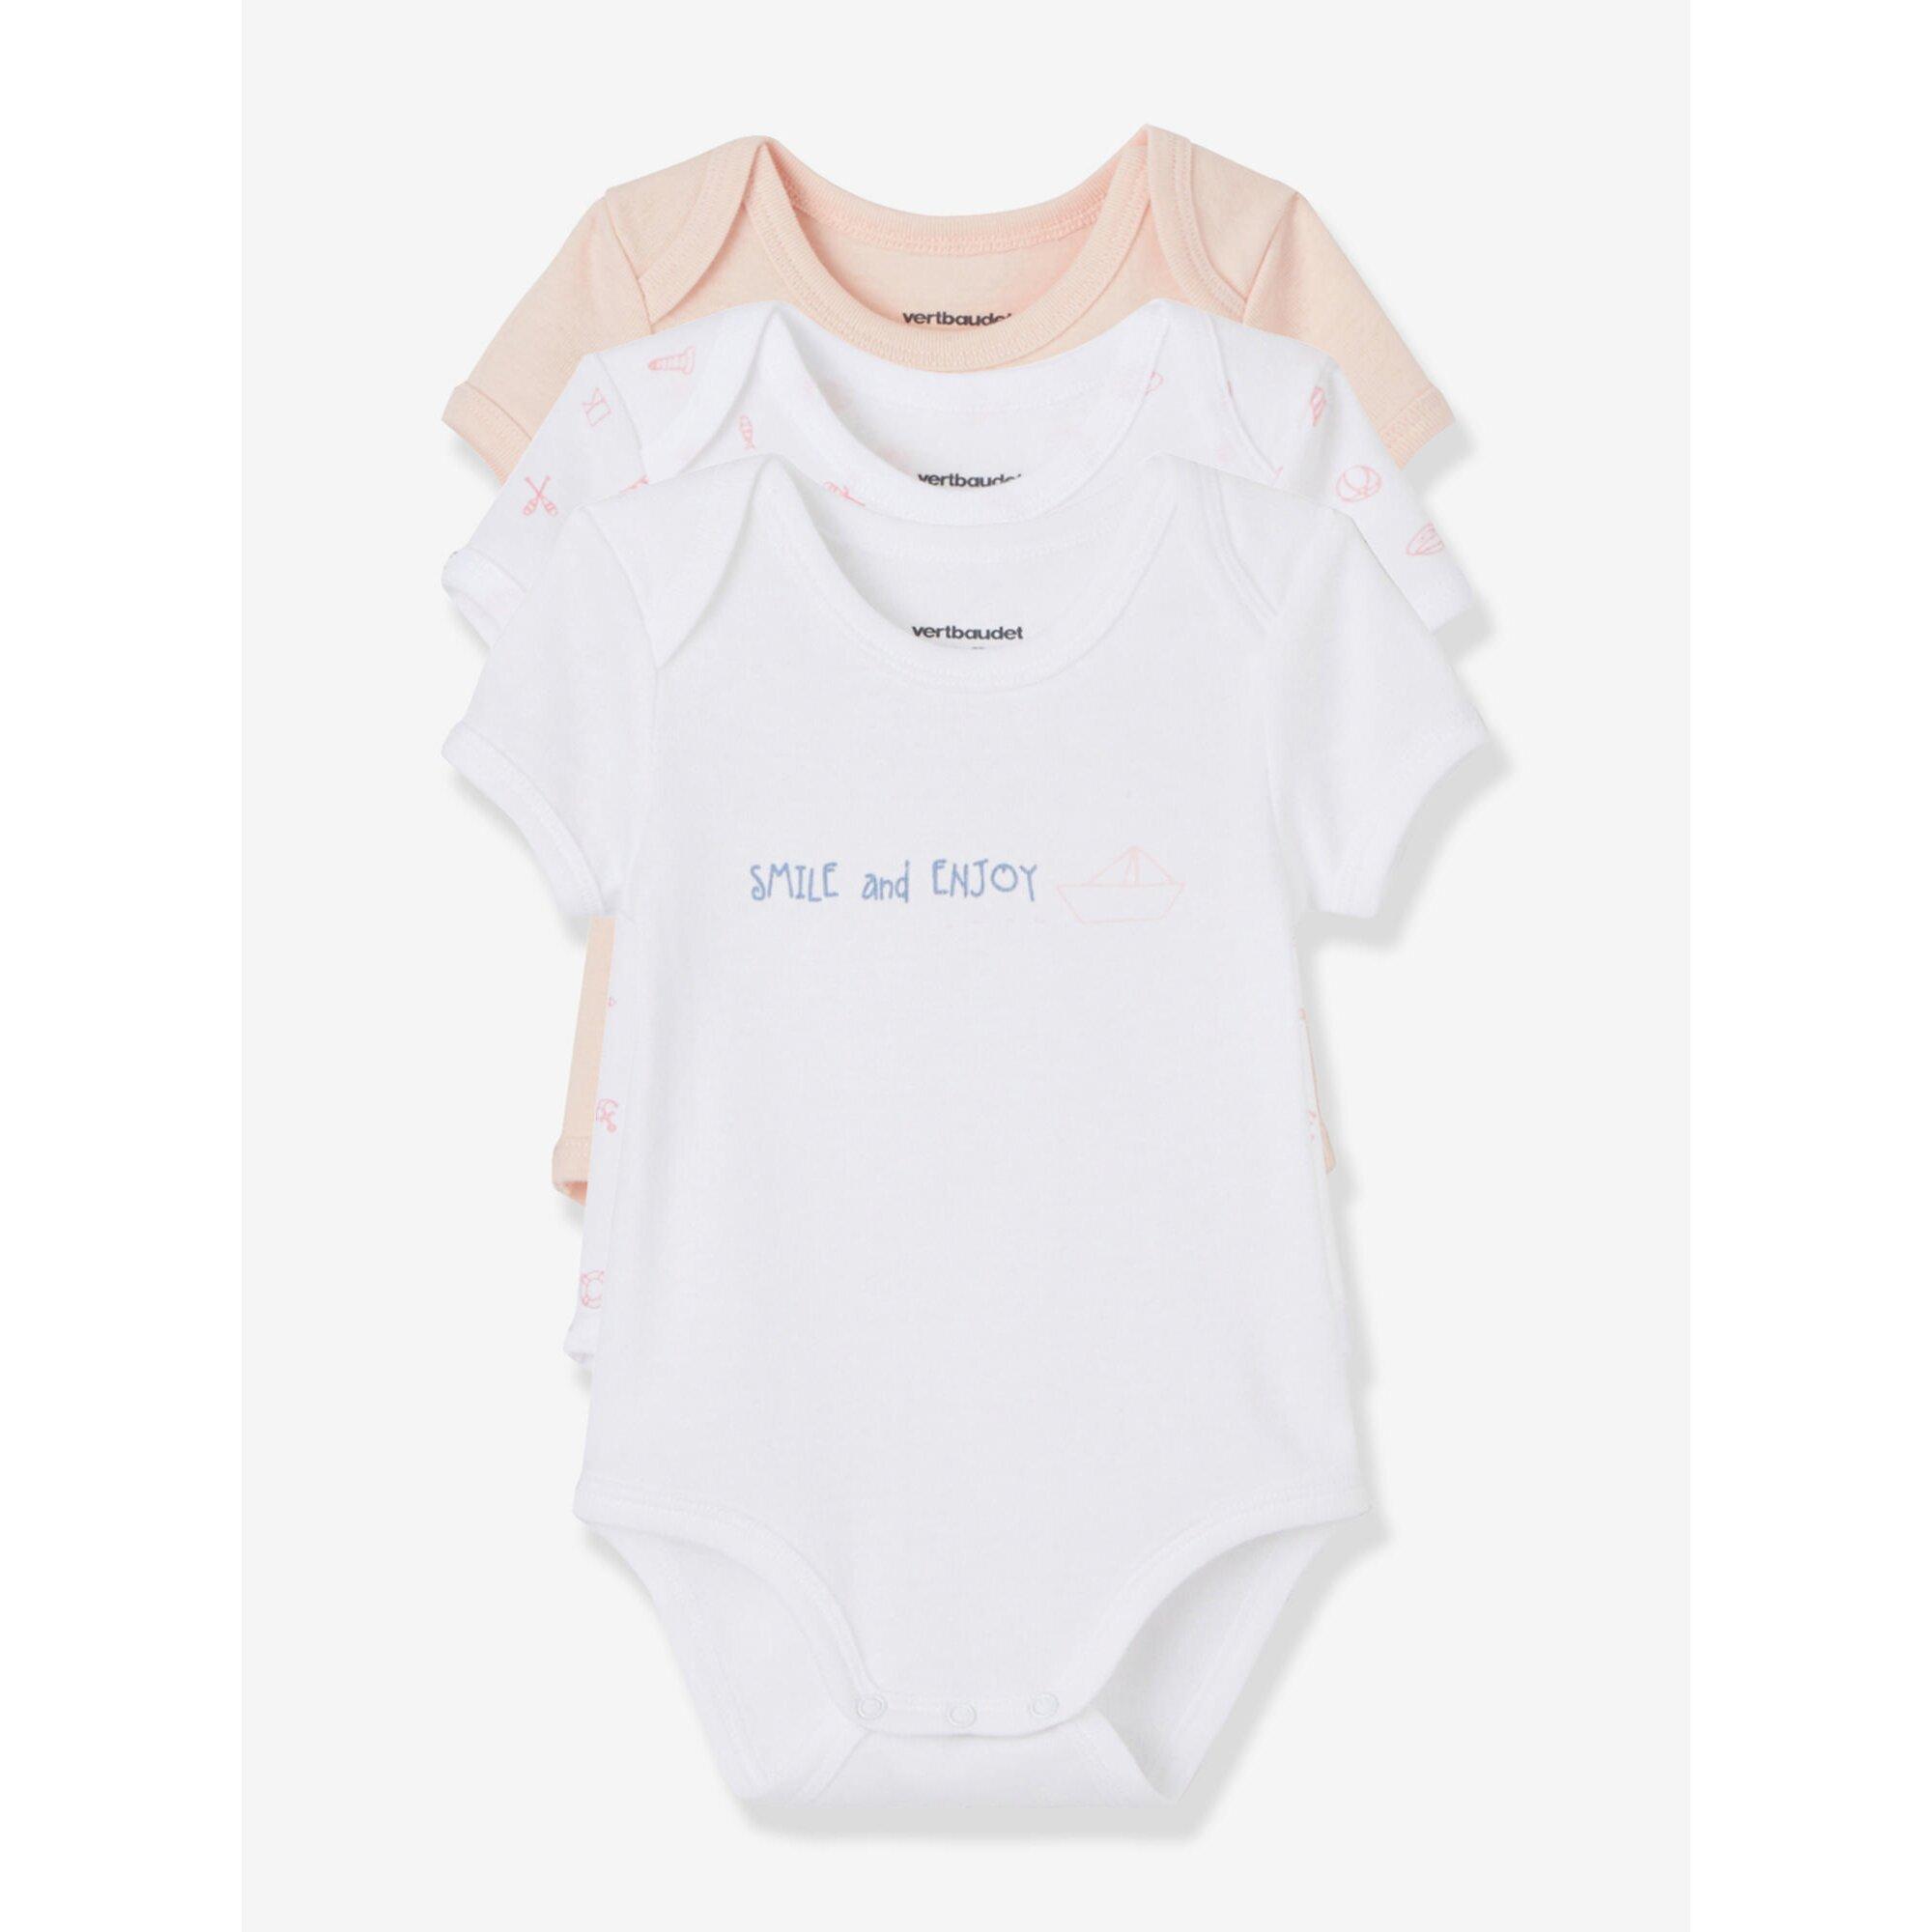 vertbaudet-bio-kollektion-3er-pack-baby-bodys-kurzarm